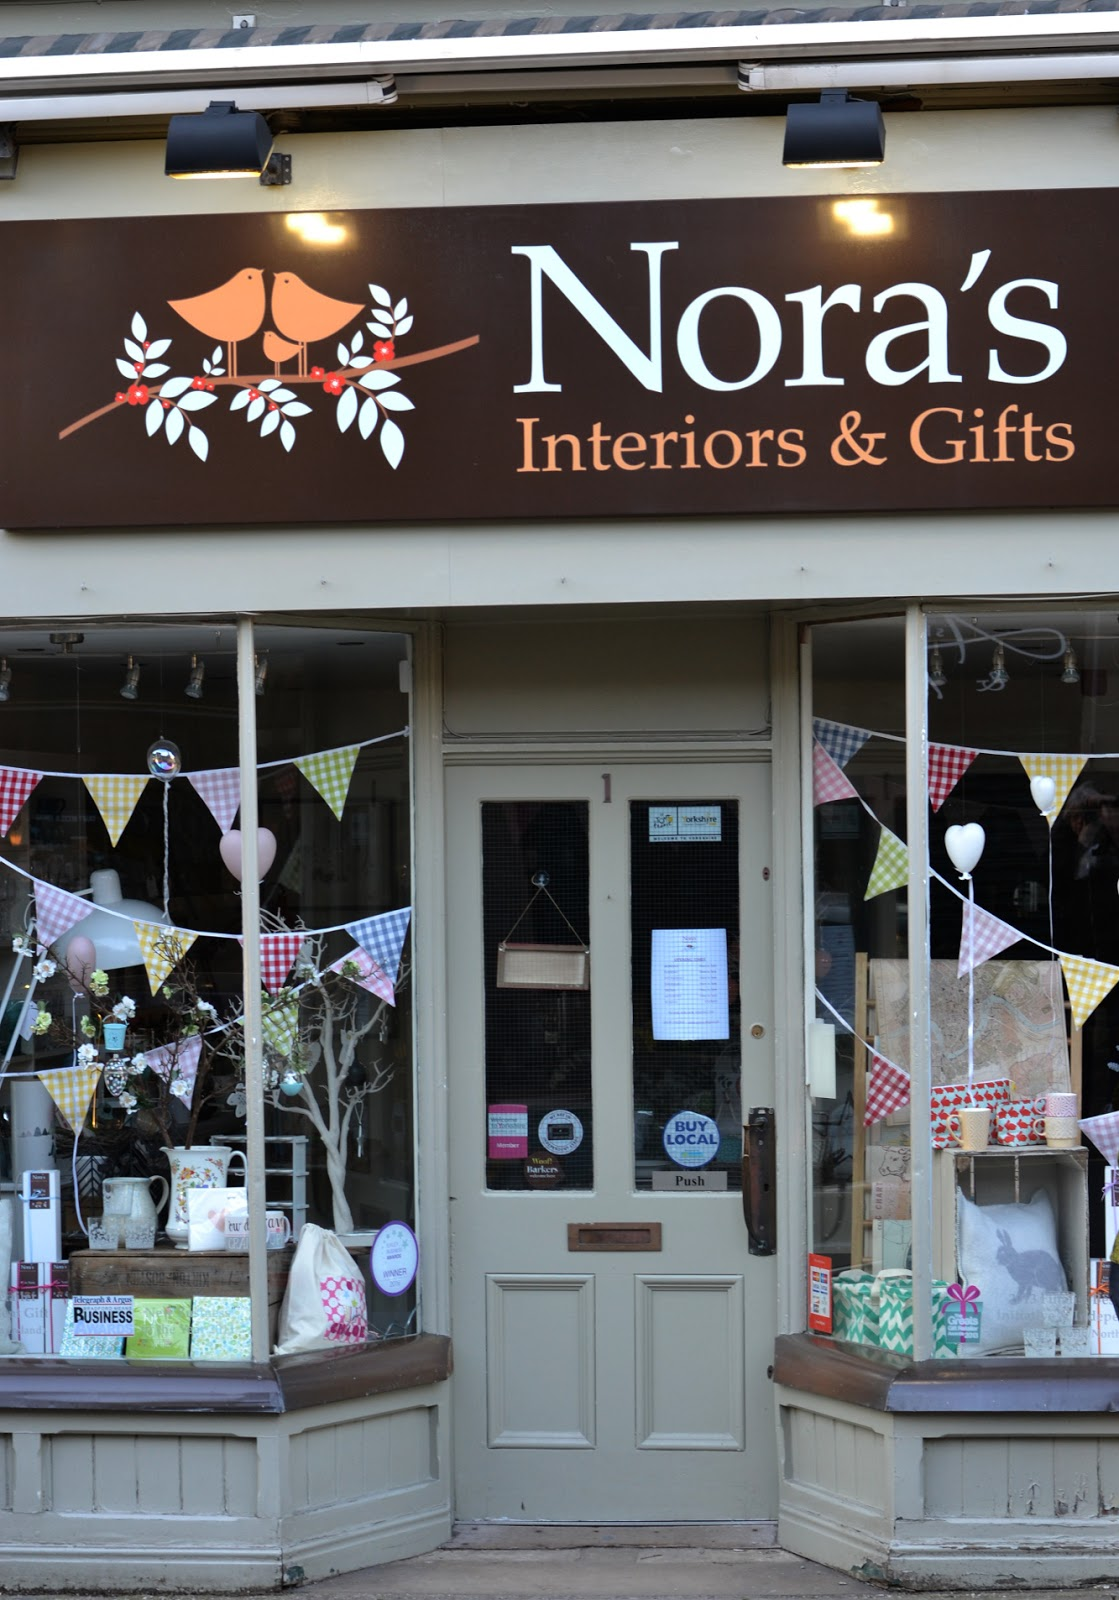 Nora's Ilkley Yorkshire